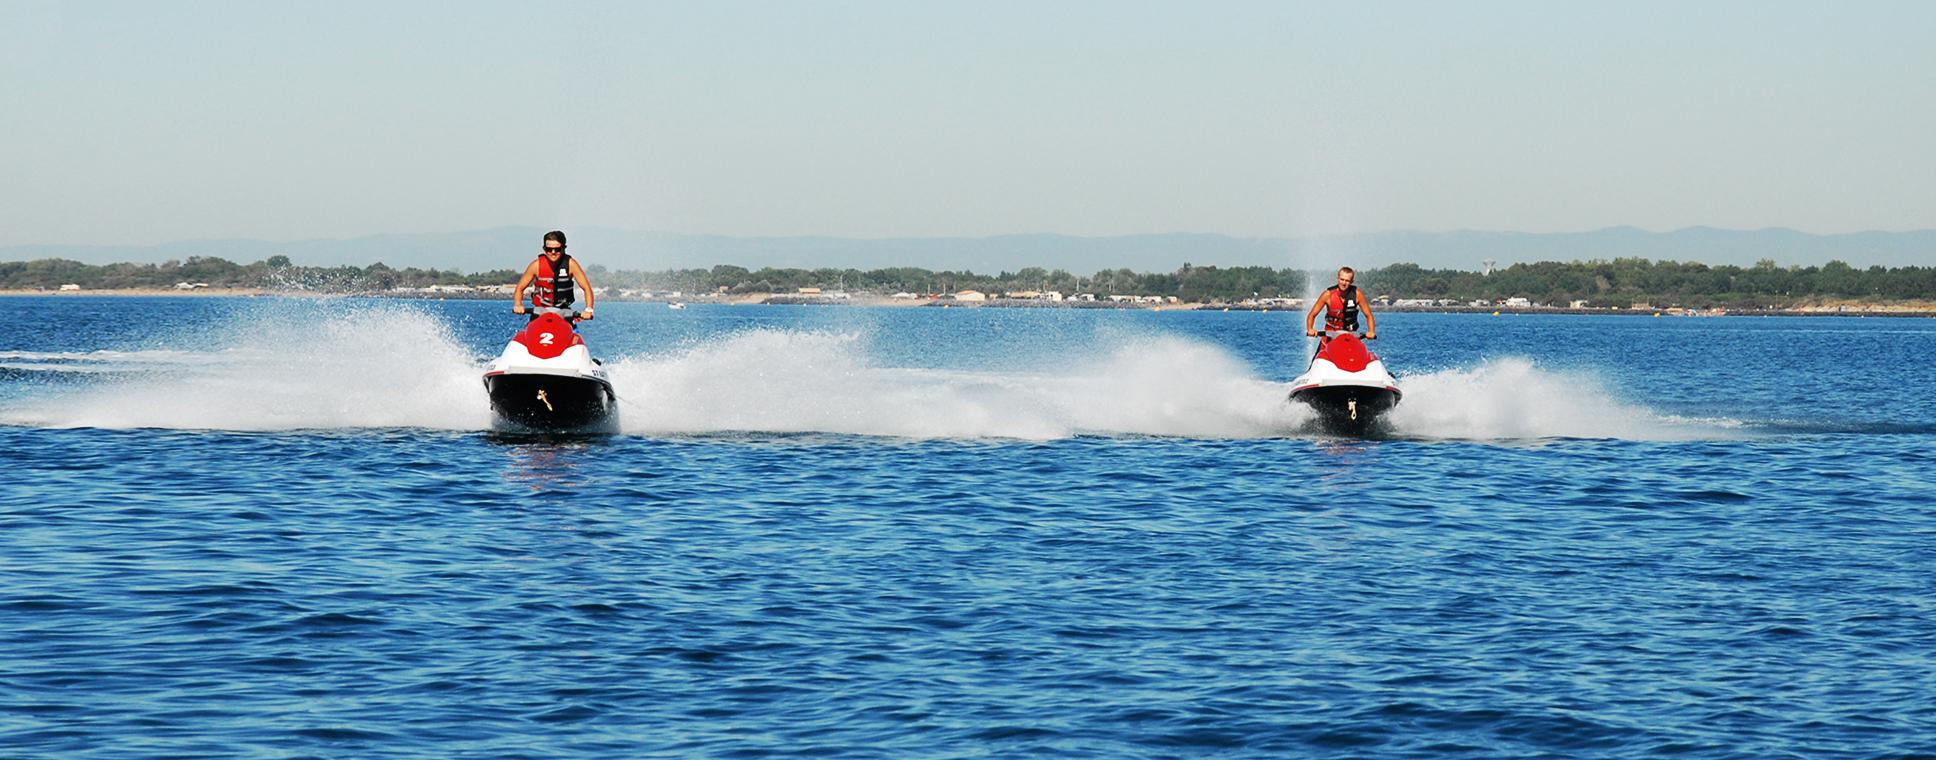 Playa water sports